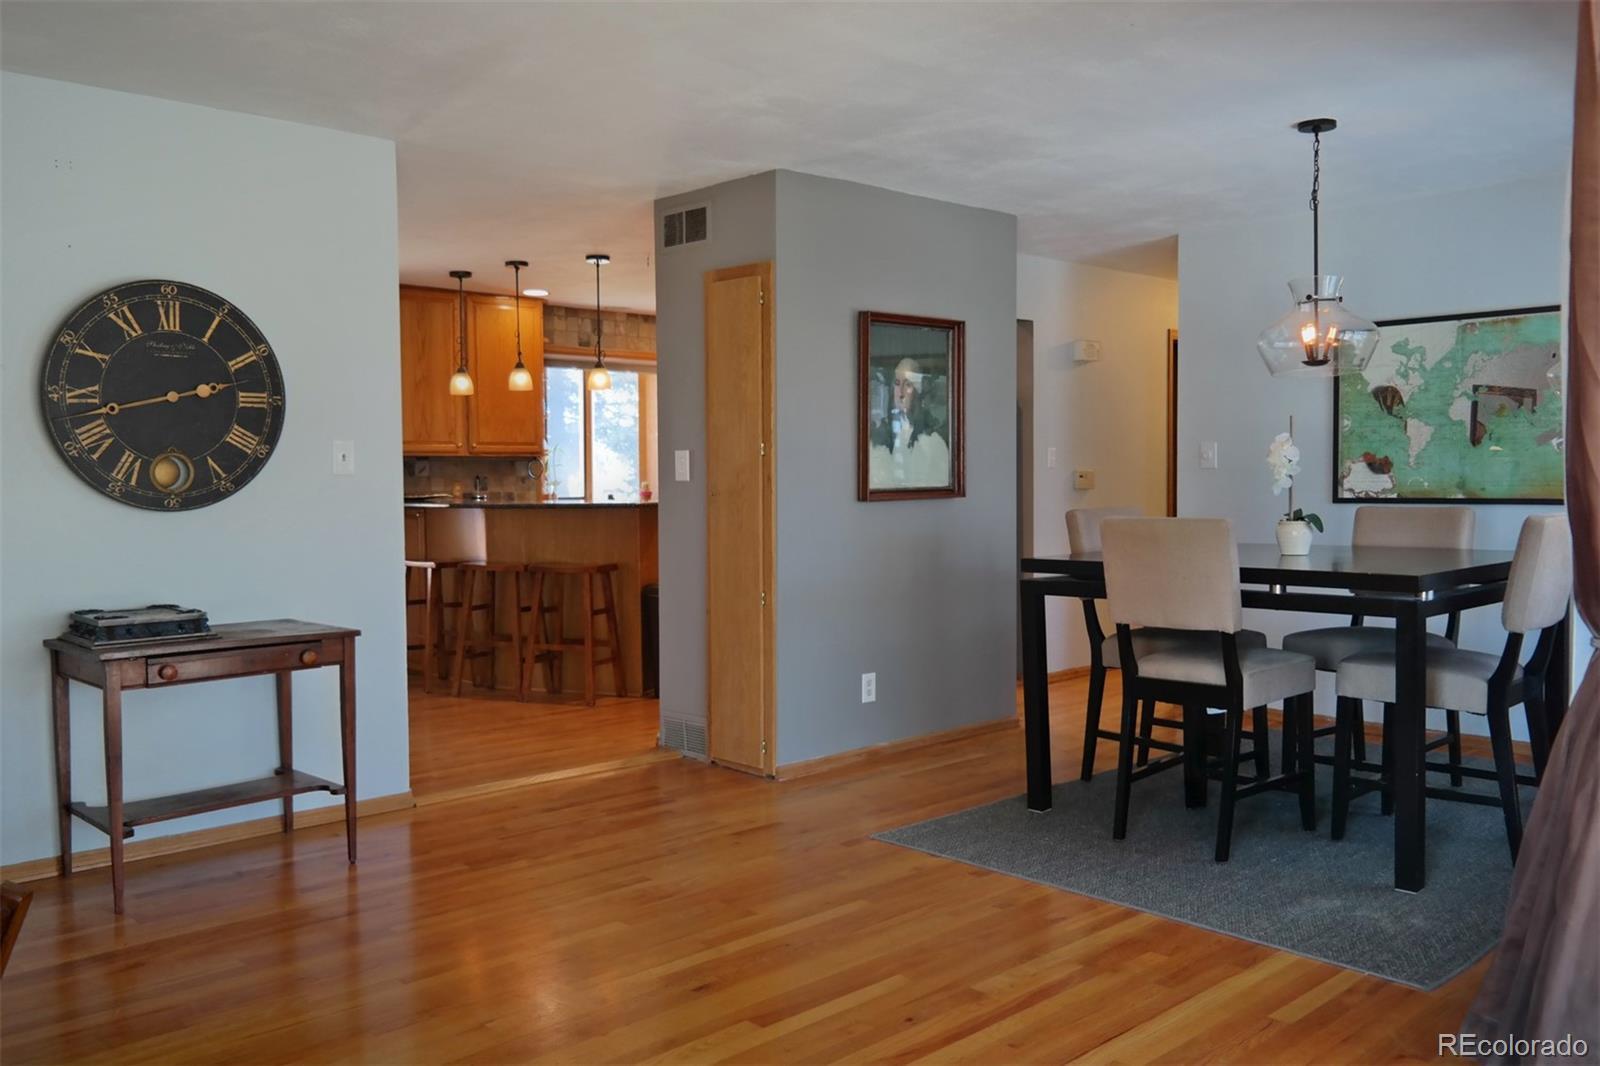 MLS# 1763808 - 7 - 10558 Roseland Avenue, Longmont, CO 80504